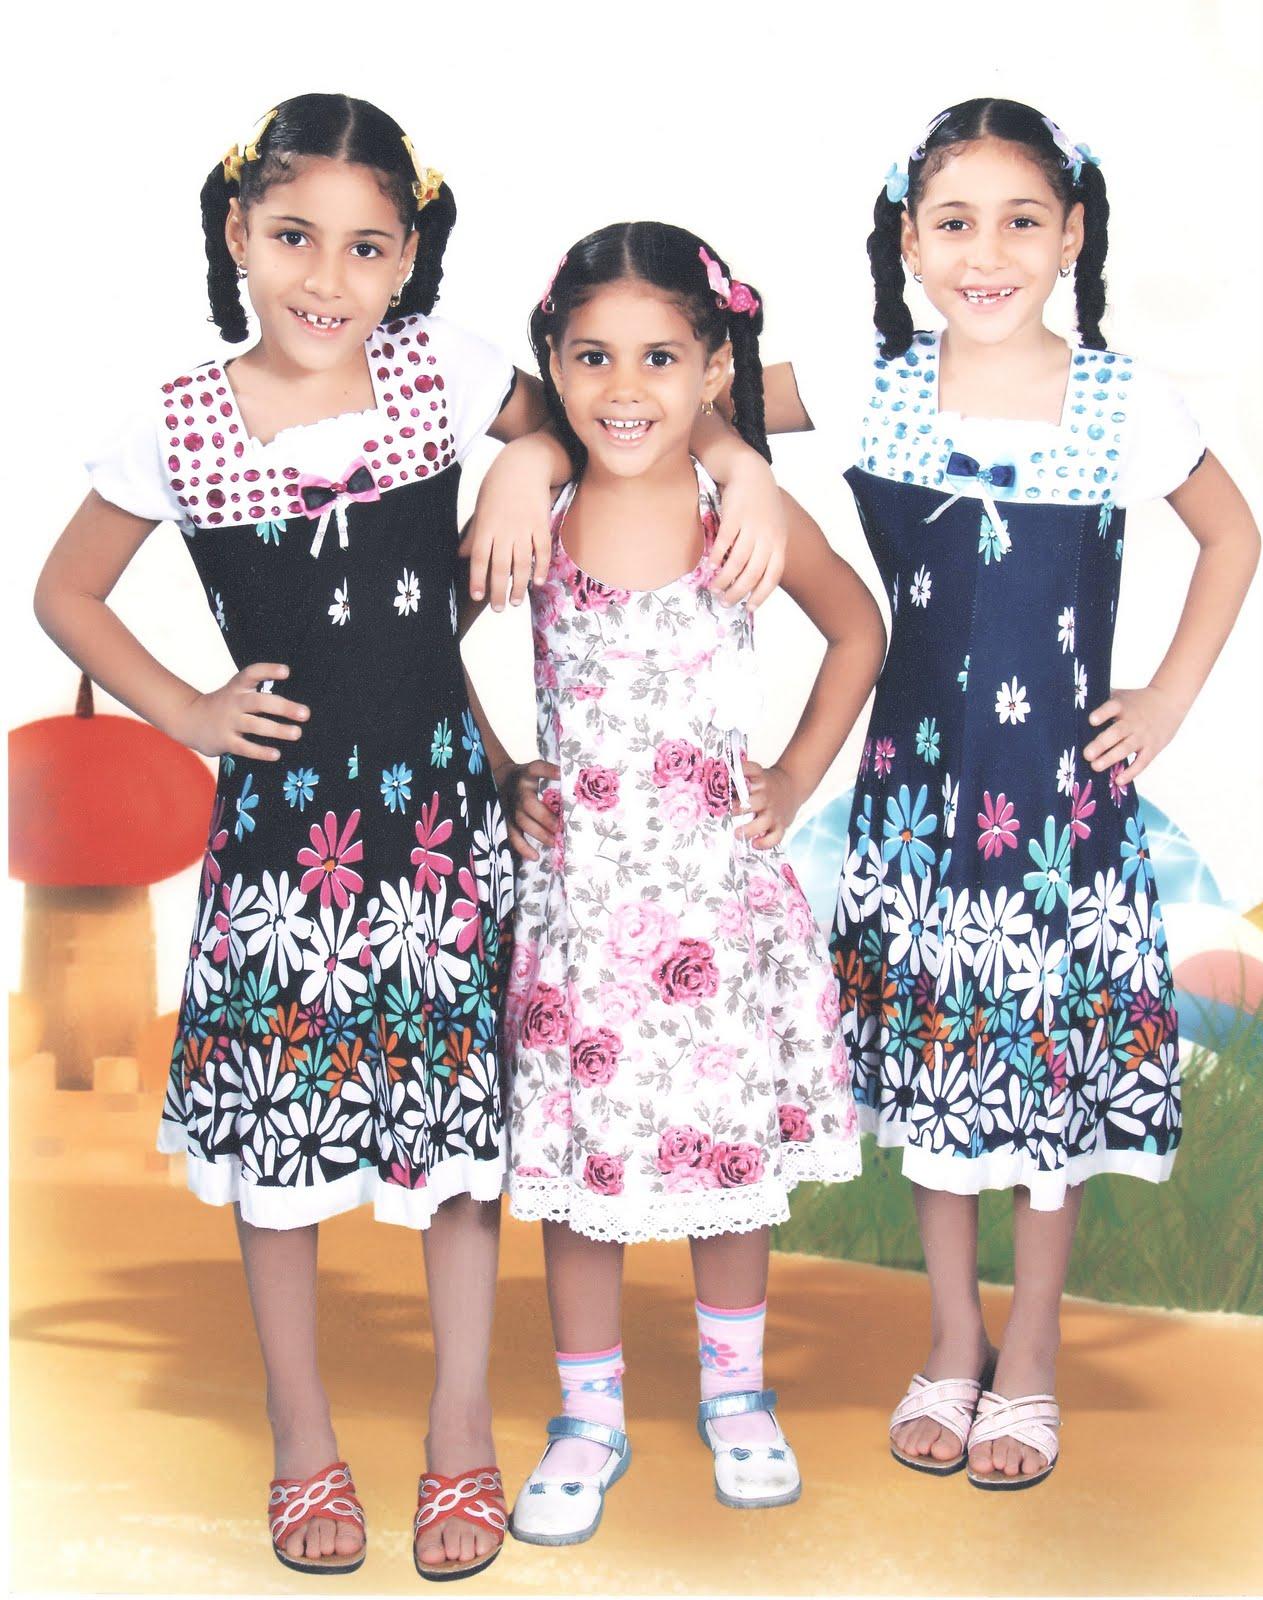 Farida, Farah, Nariman